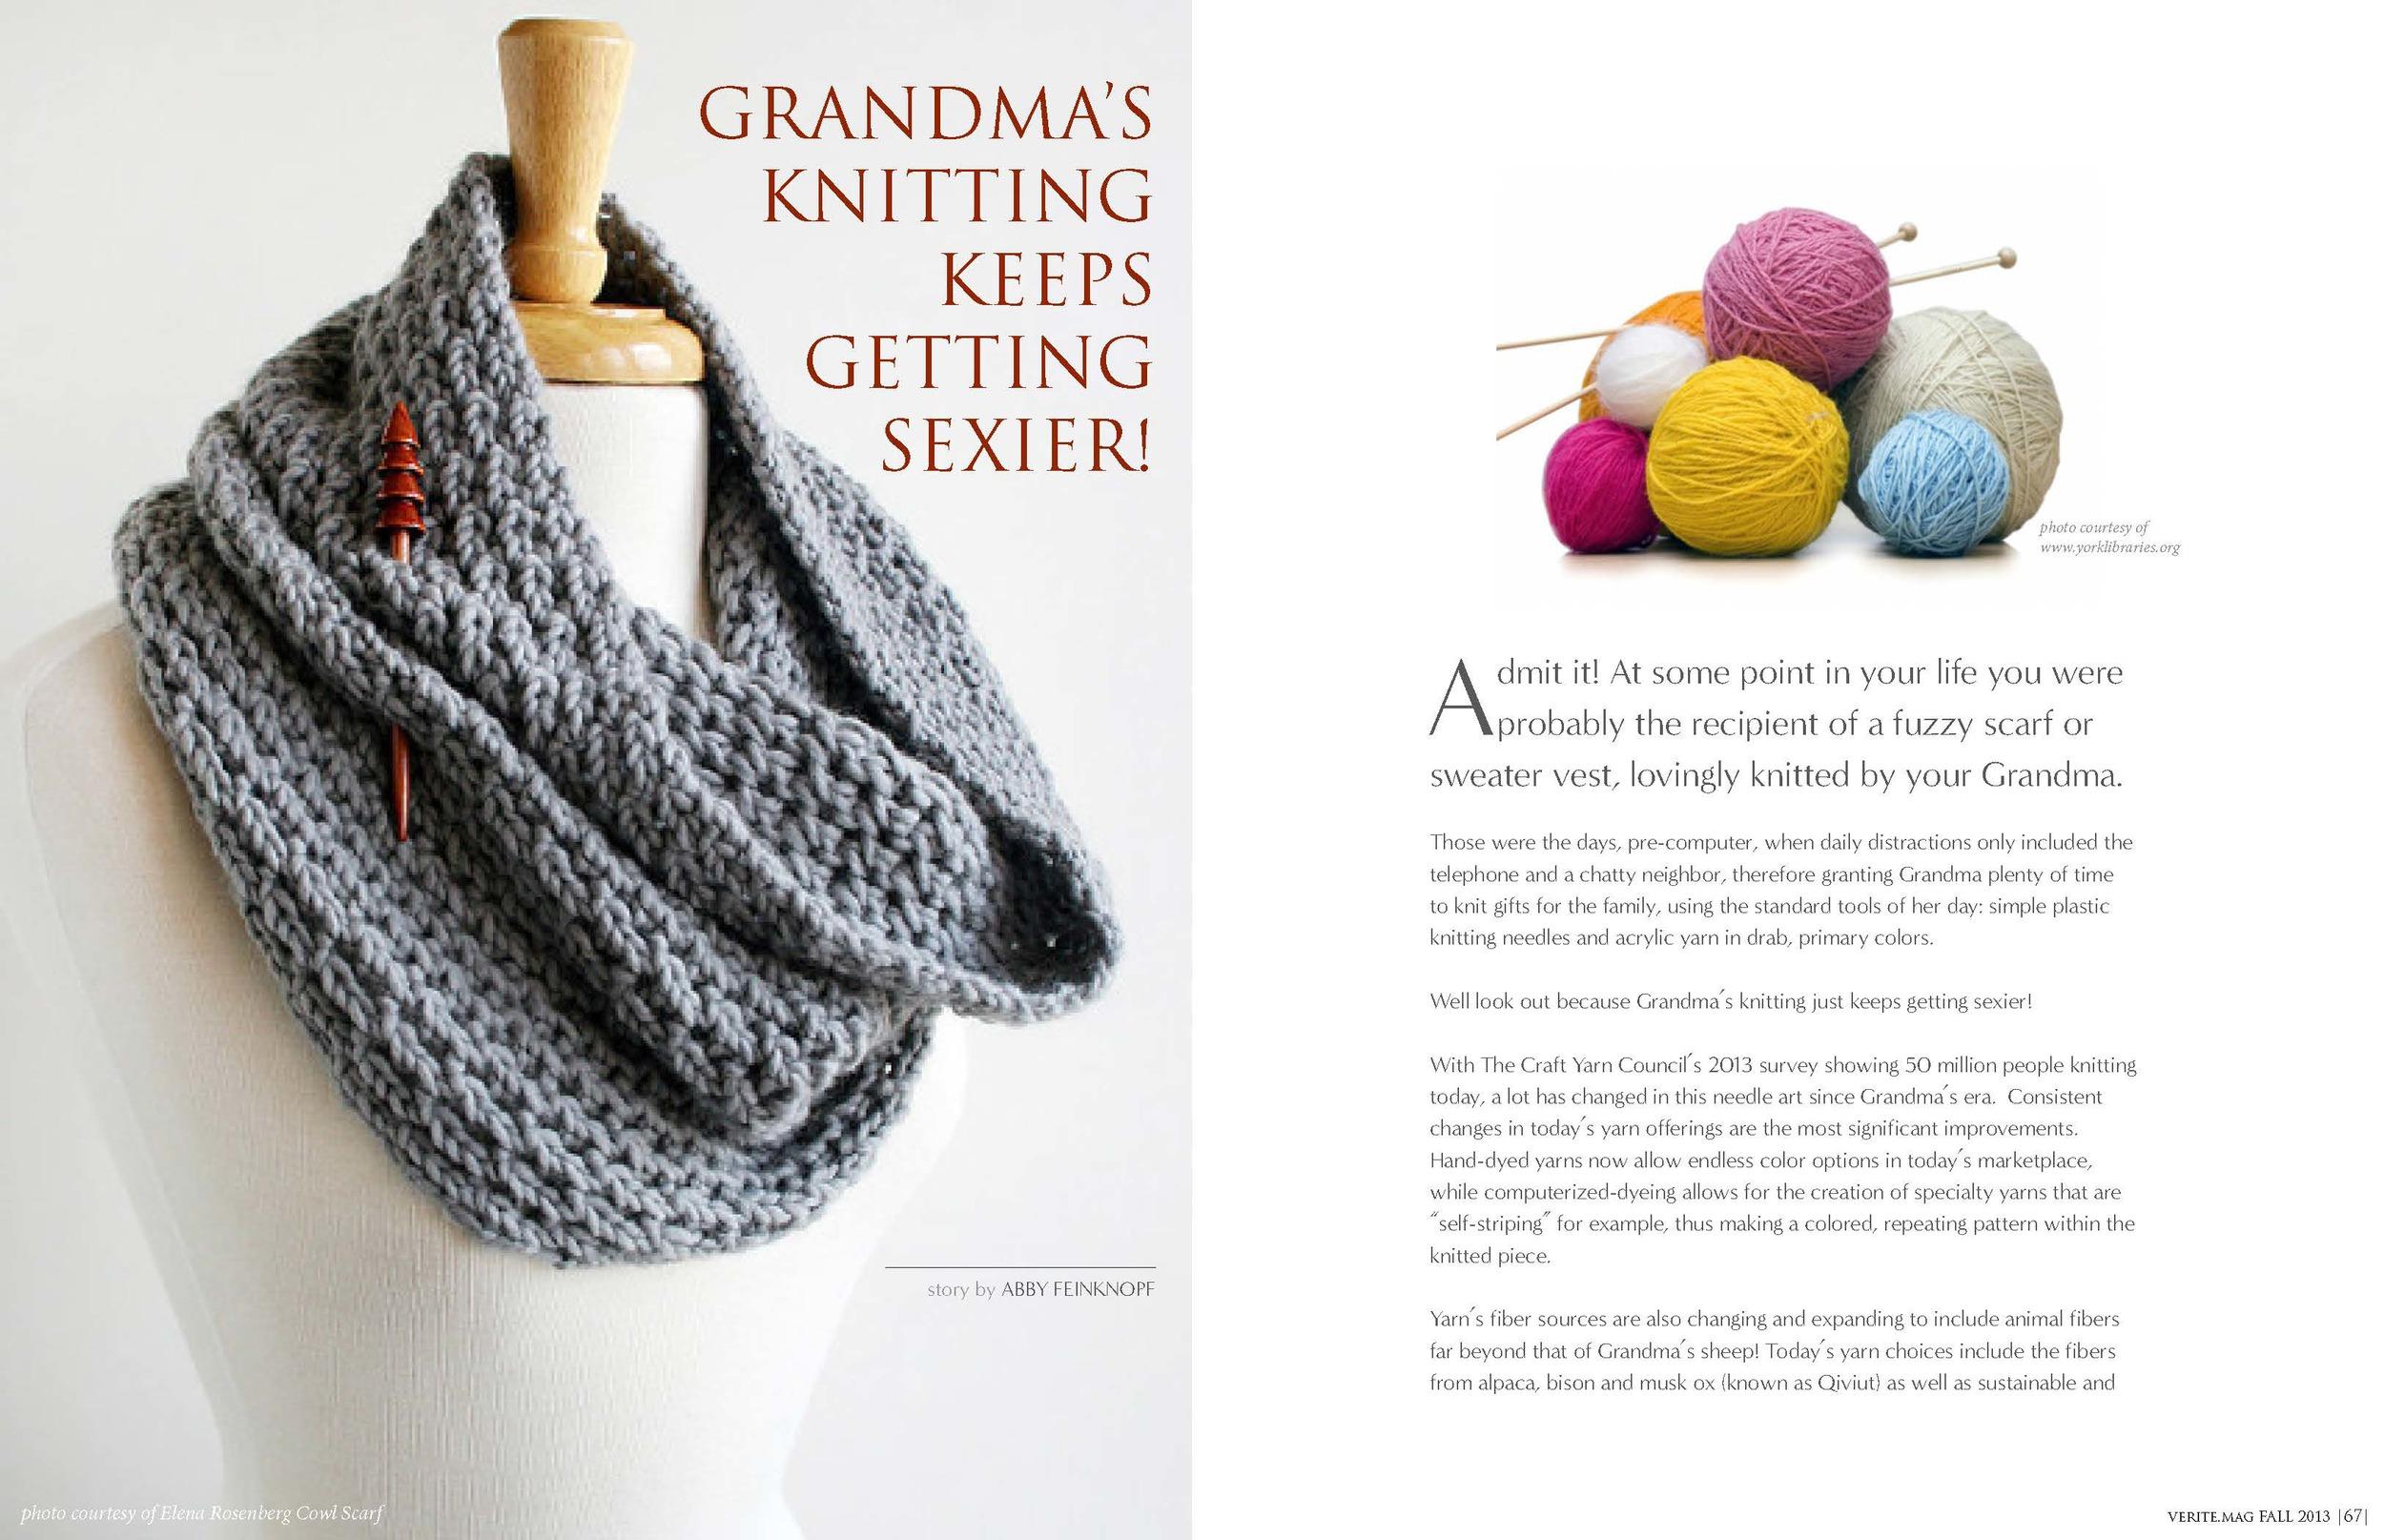 Verite Fall 2013 Knitting_Page_1.jpg